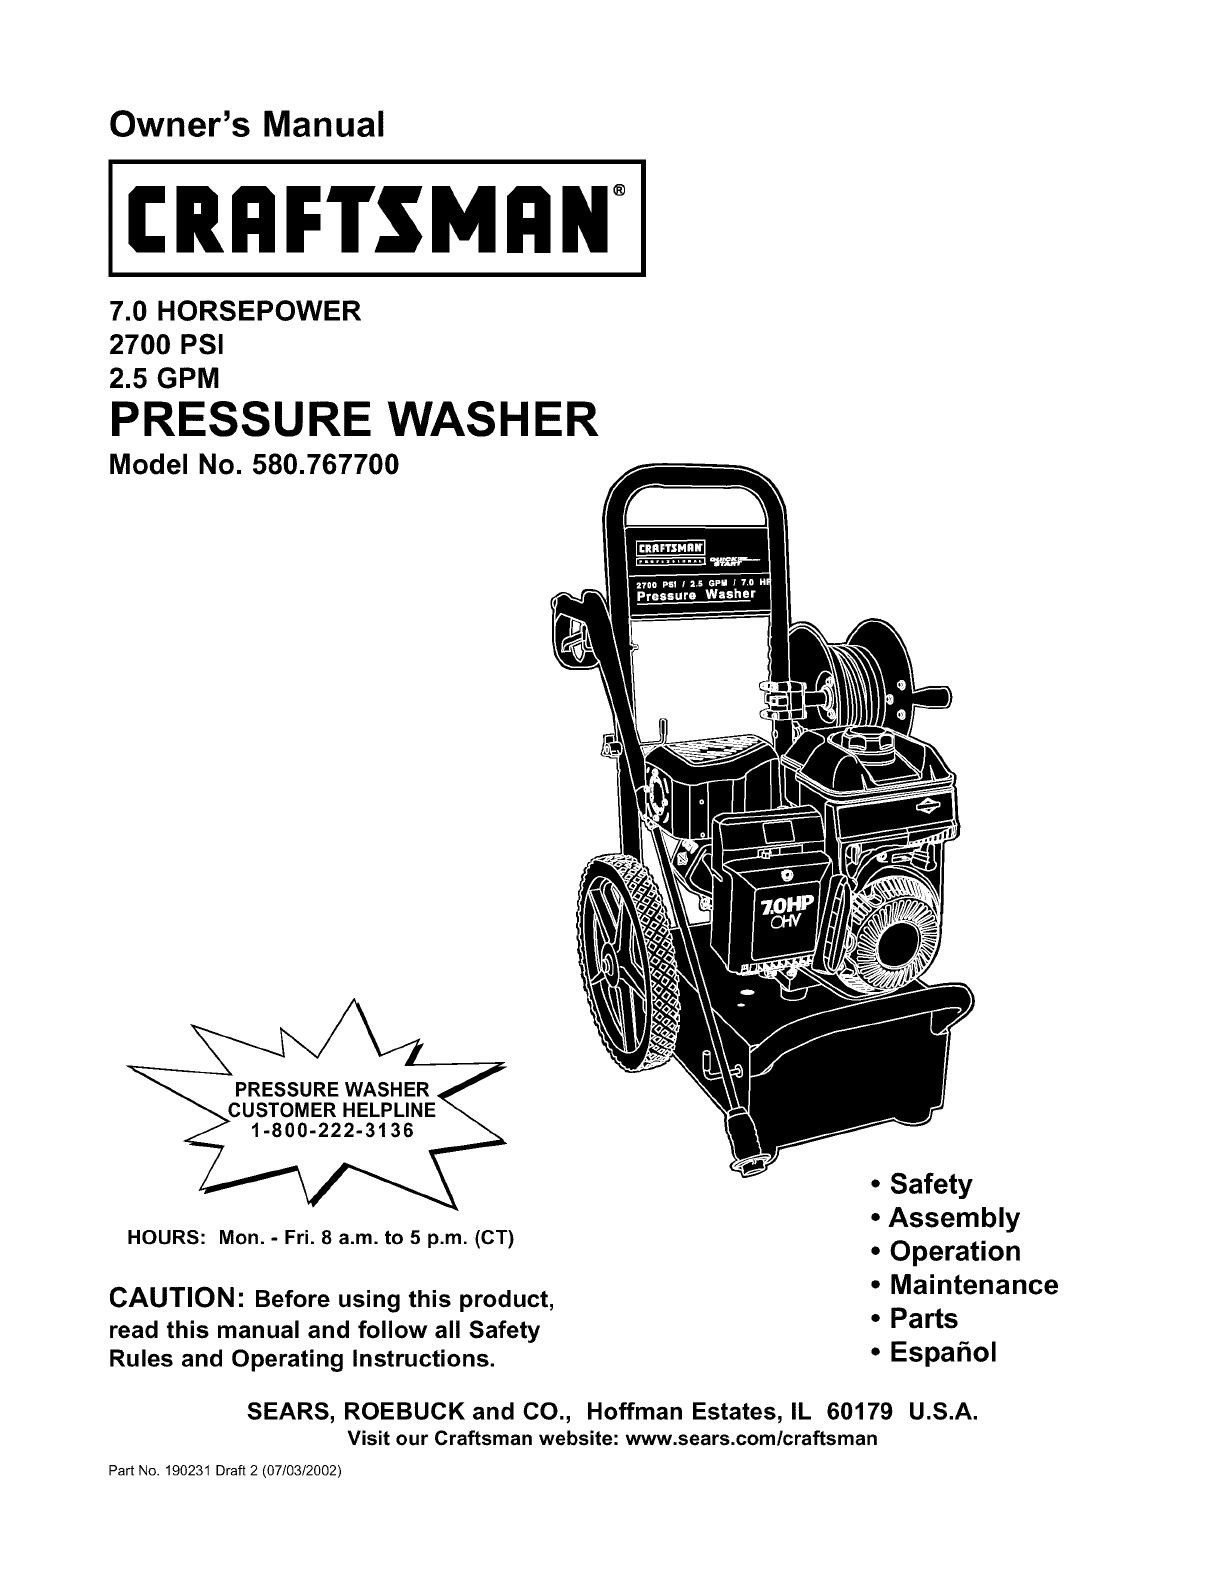 Craftsman 580767700 User Manual Pressure Washer Manuals And Guides. Craftsman 580767700 User Manual Pressure Washer Manuals And Guides L0209073. Wiring. Craftsman Pressure Washer Engine Parts Diagram At Scoala.co